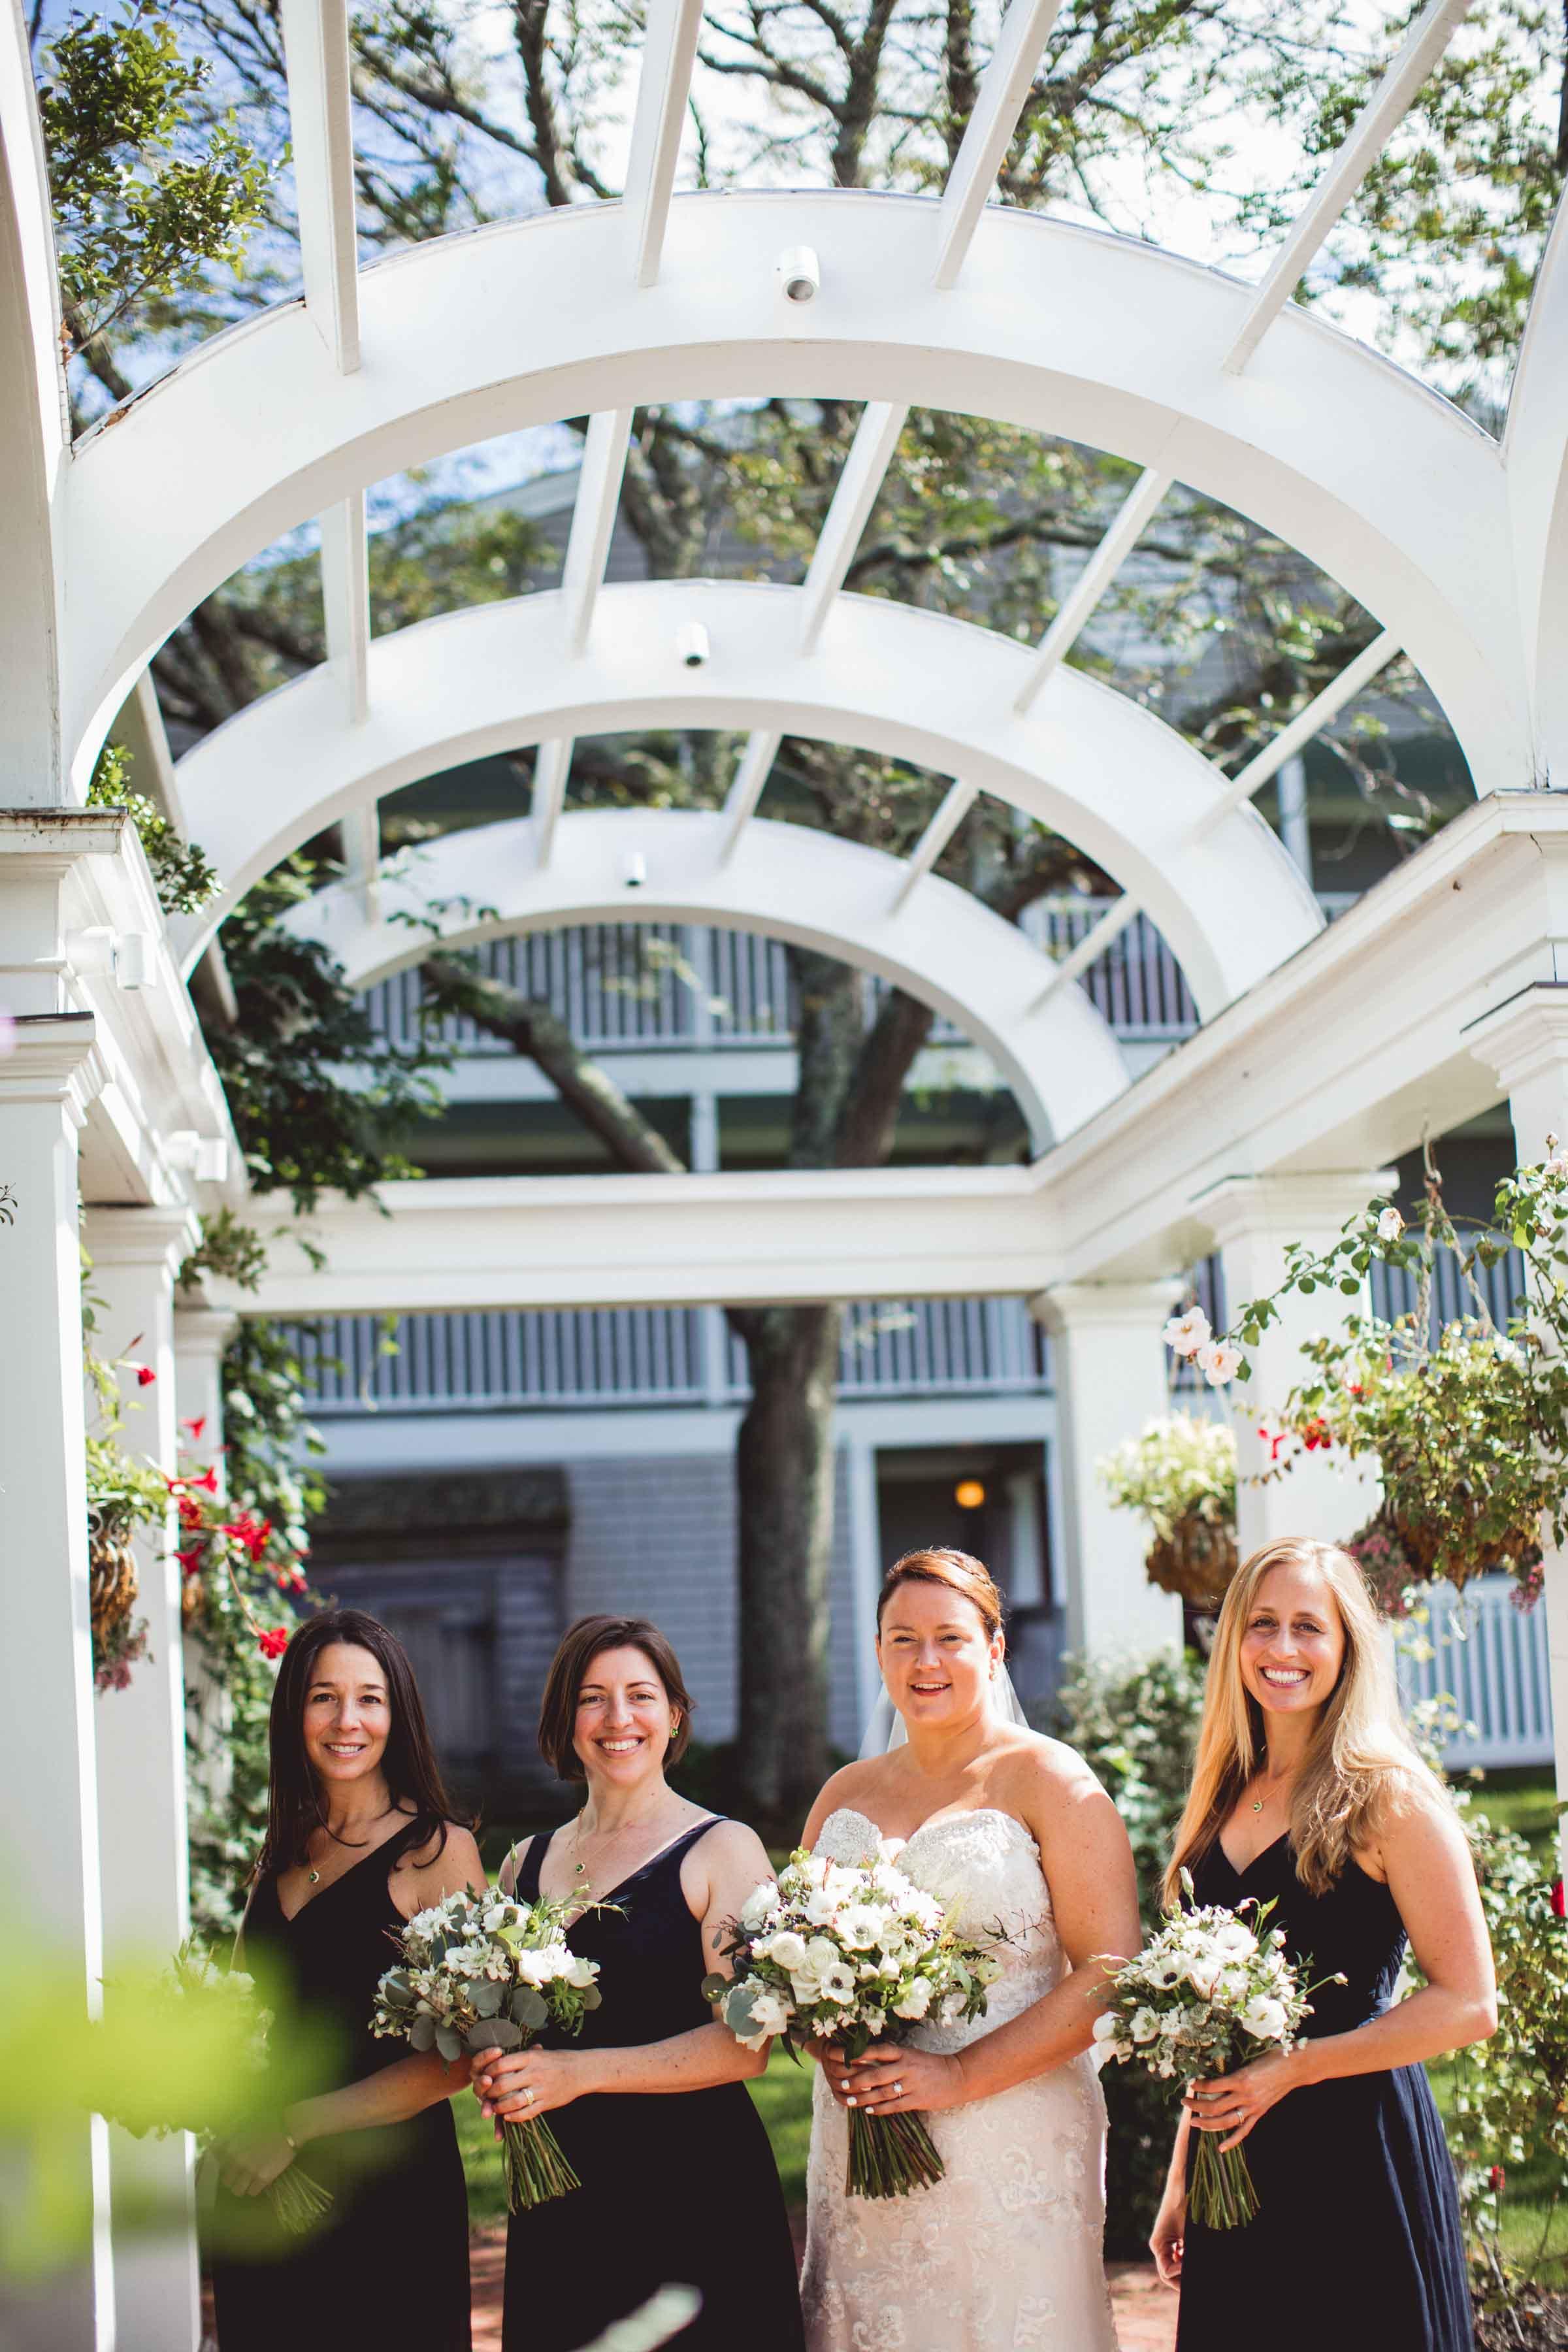 Marthas-vineyard-wedding-12.jpg